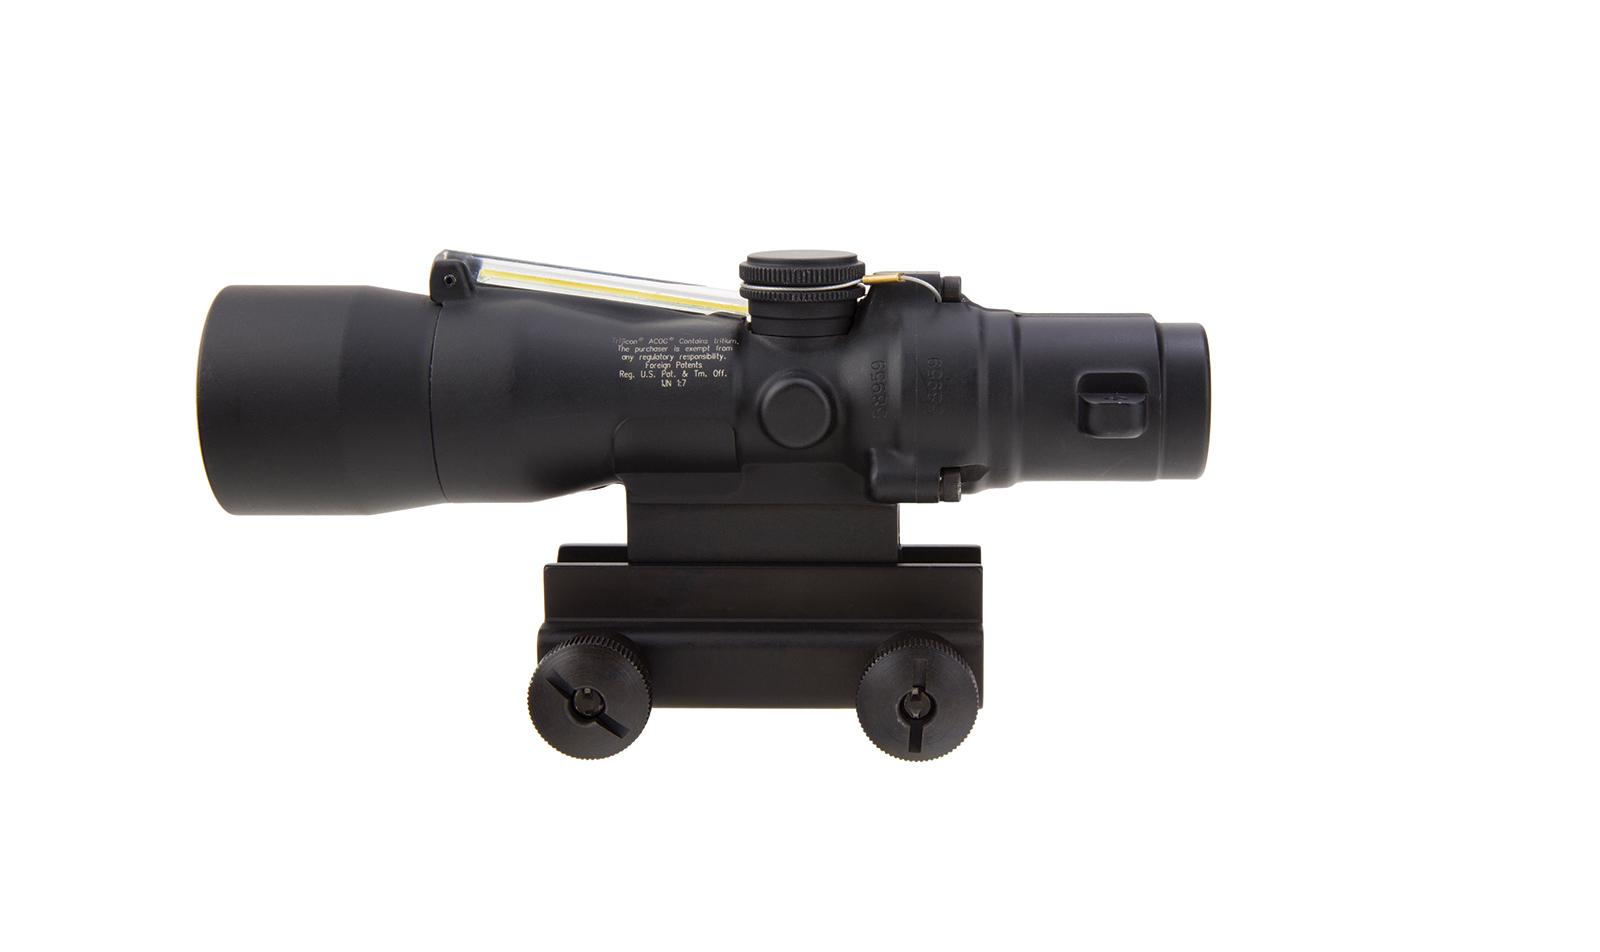 TA33-C-400130 angle 2